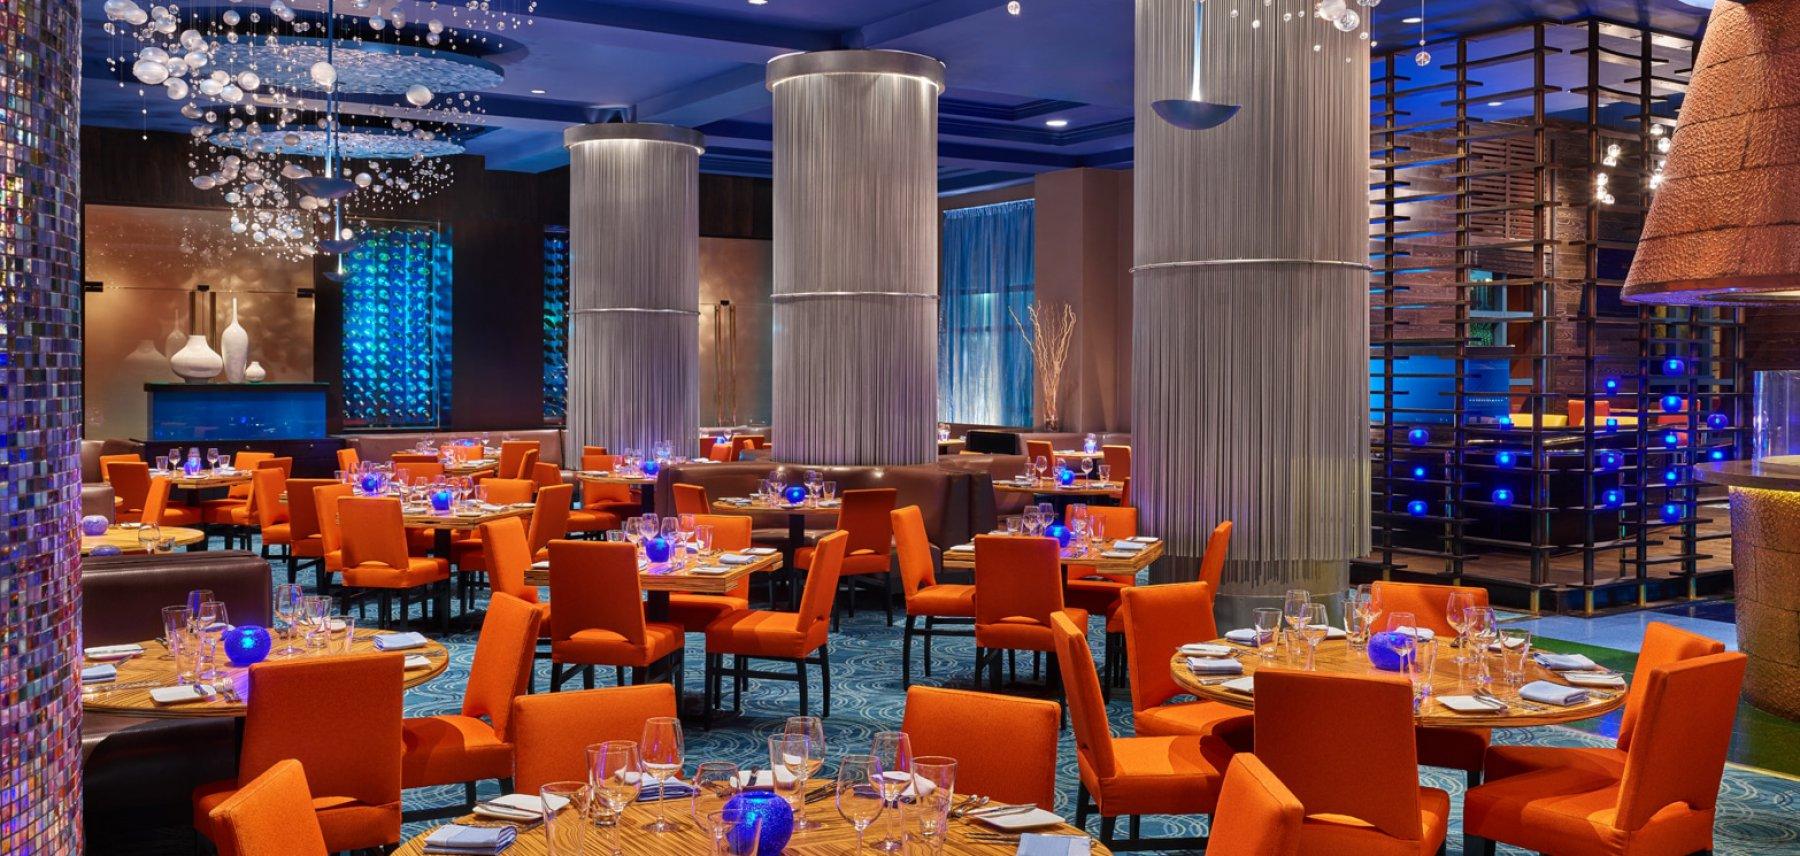 The main dining room at Todd English's Bluezoo at the Walt Disney World Dolphin Resort